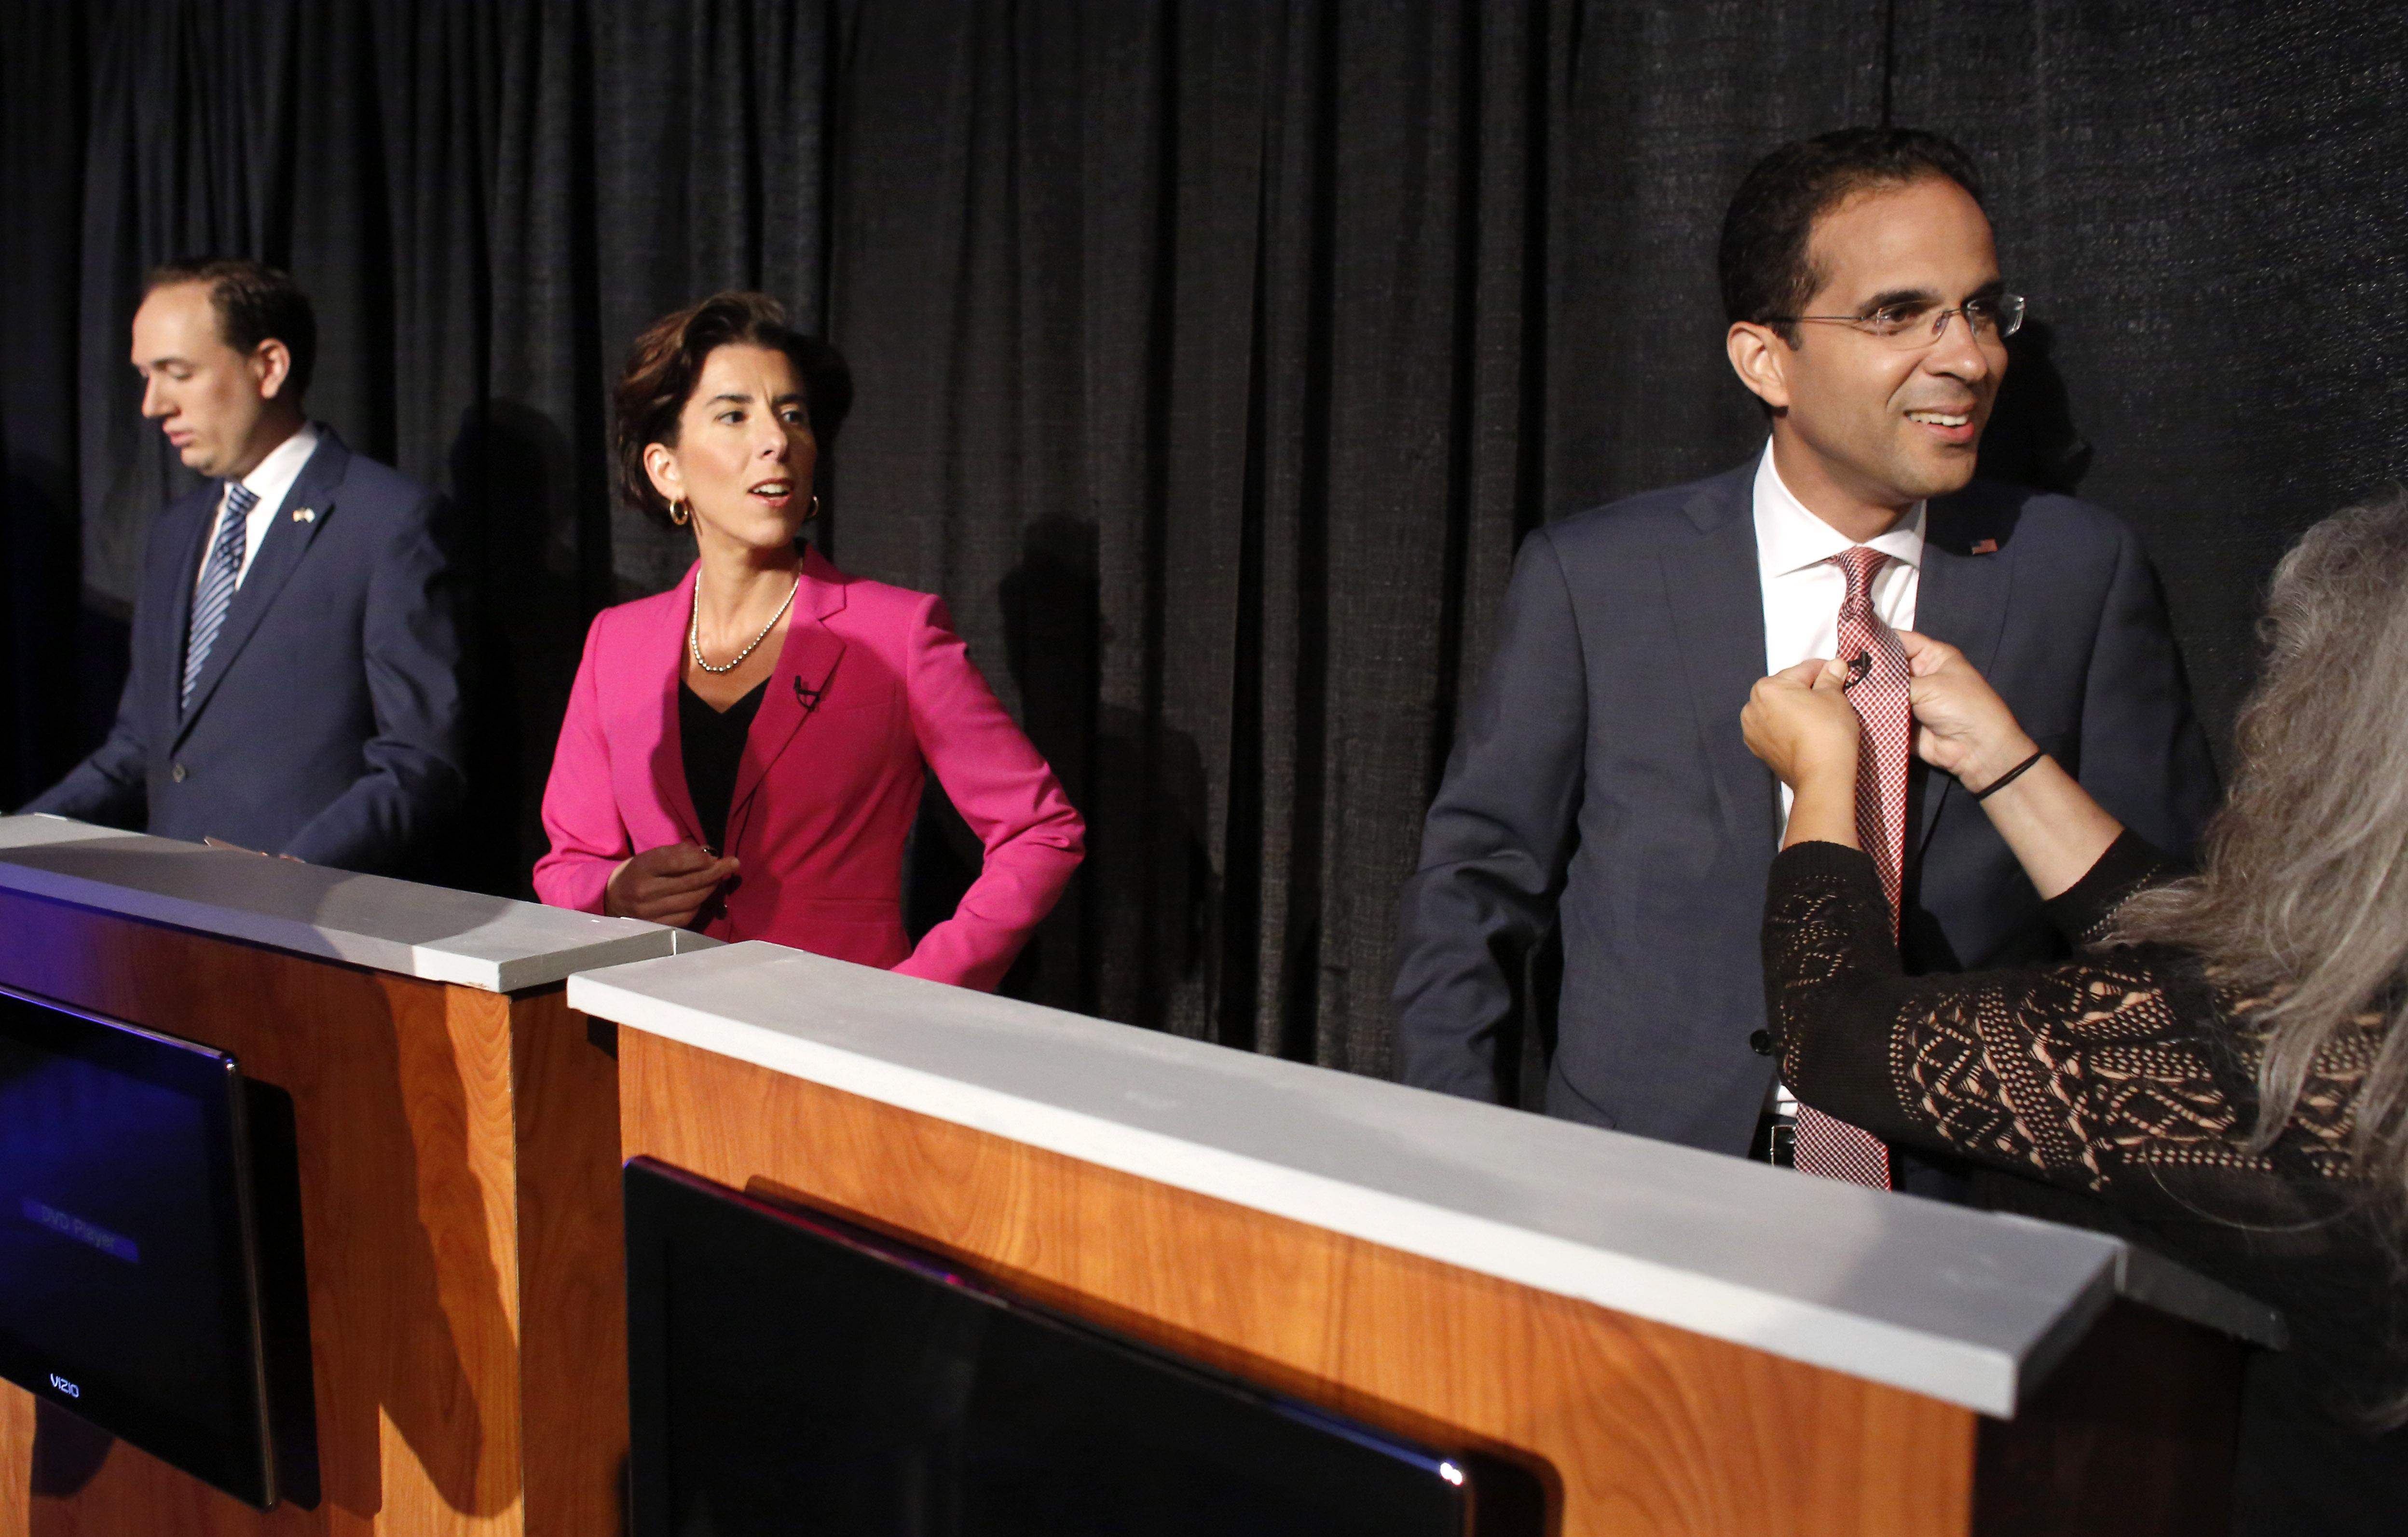 Rhode Island Democratic gubernatorial hopefuls, from the left, Clay Pell, Gina Raimondo and Angel Taveras.